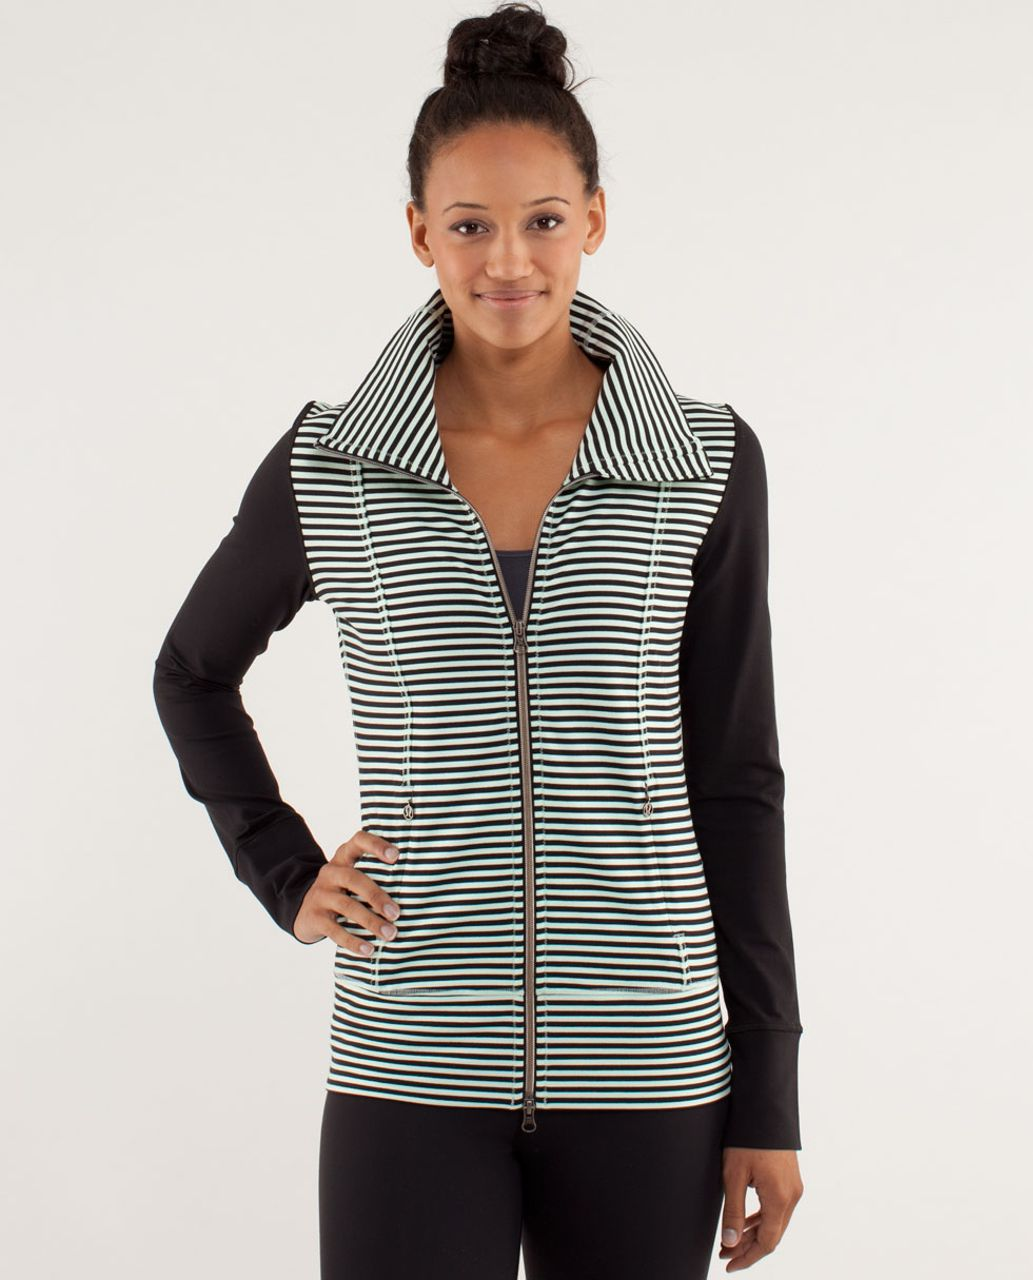 97fc614f57 Lululemon Daily Yoga Jacket - Classic Stripe Mint Moment Black / Black - lulu  fanatics